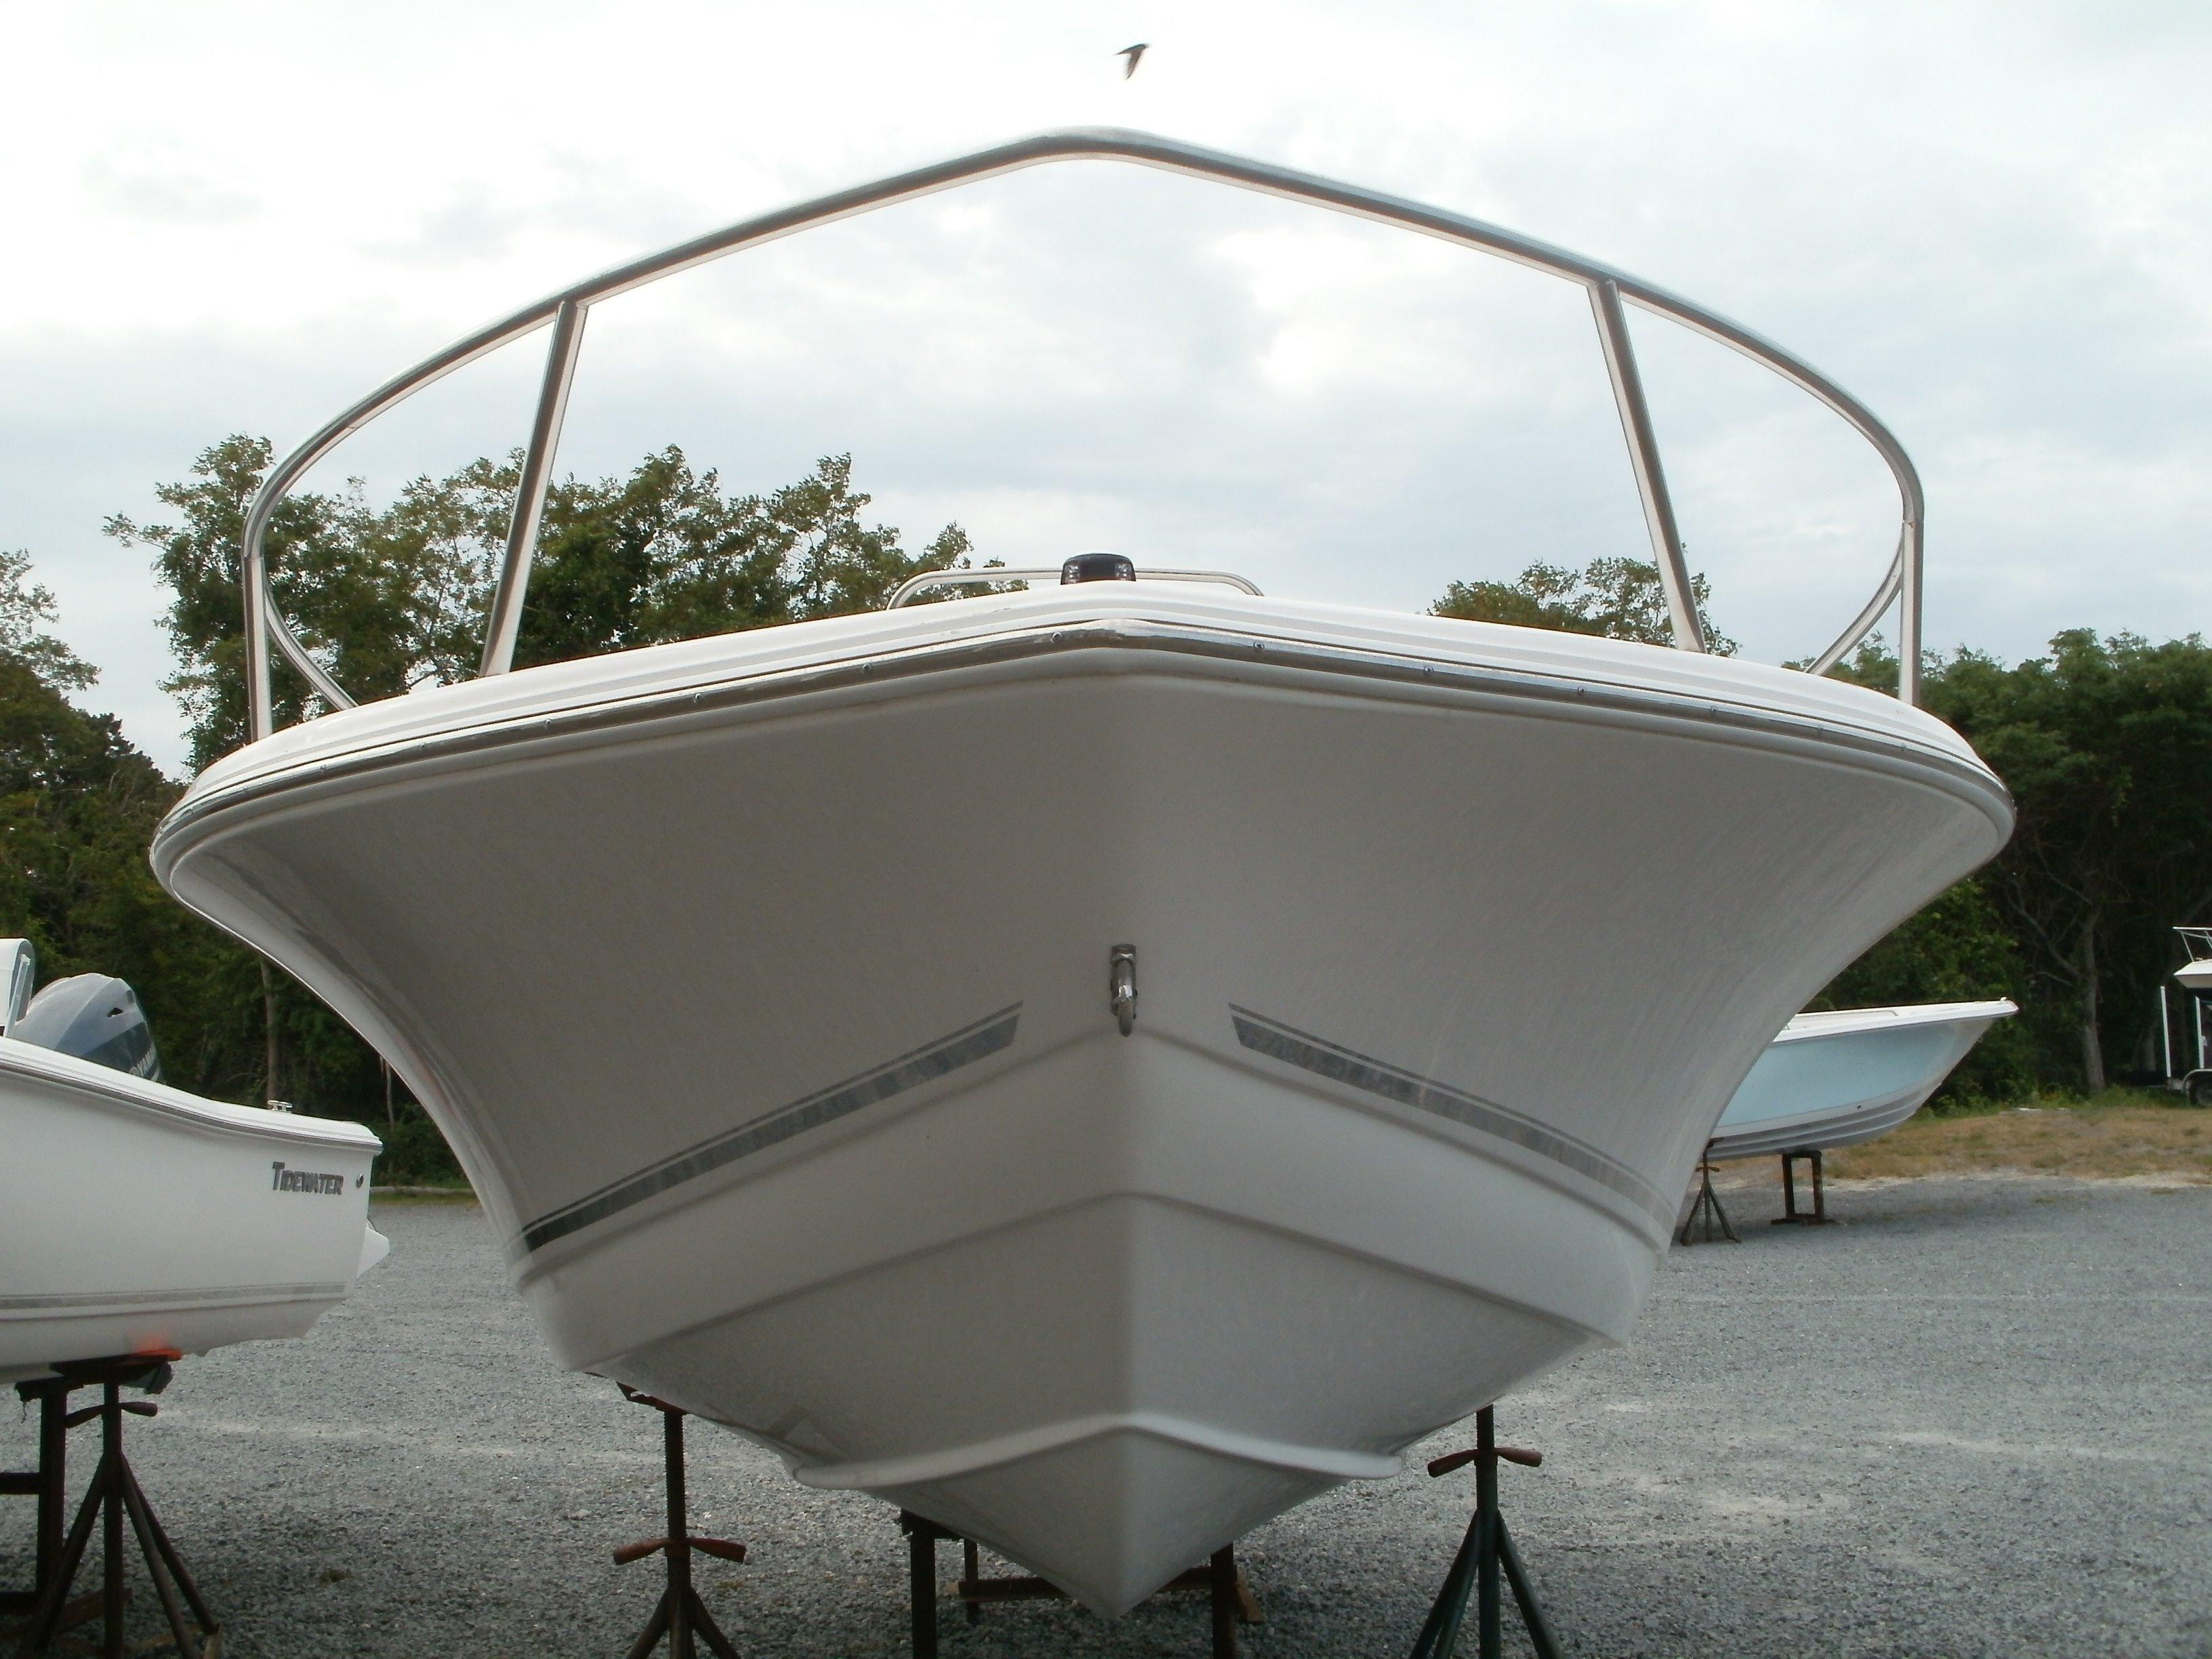 2015 Tidewater 180 CC Adventure Power Boat For Sale - www.yachtworld.com